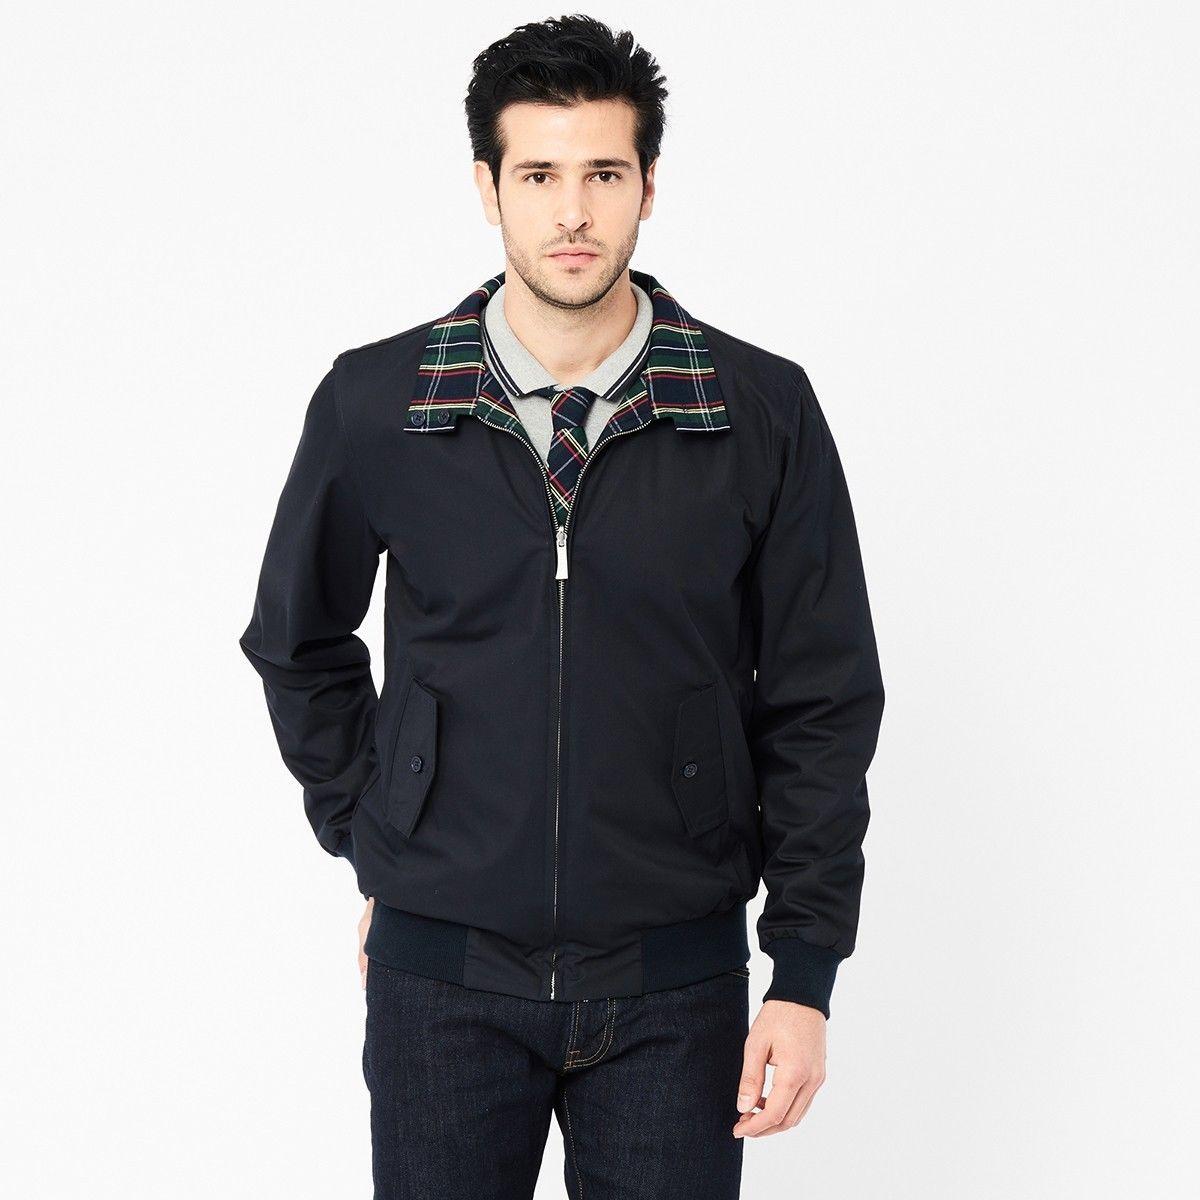 Original genuine Harrington Ltd reversible navy jacket size XS-2XL